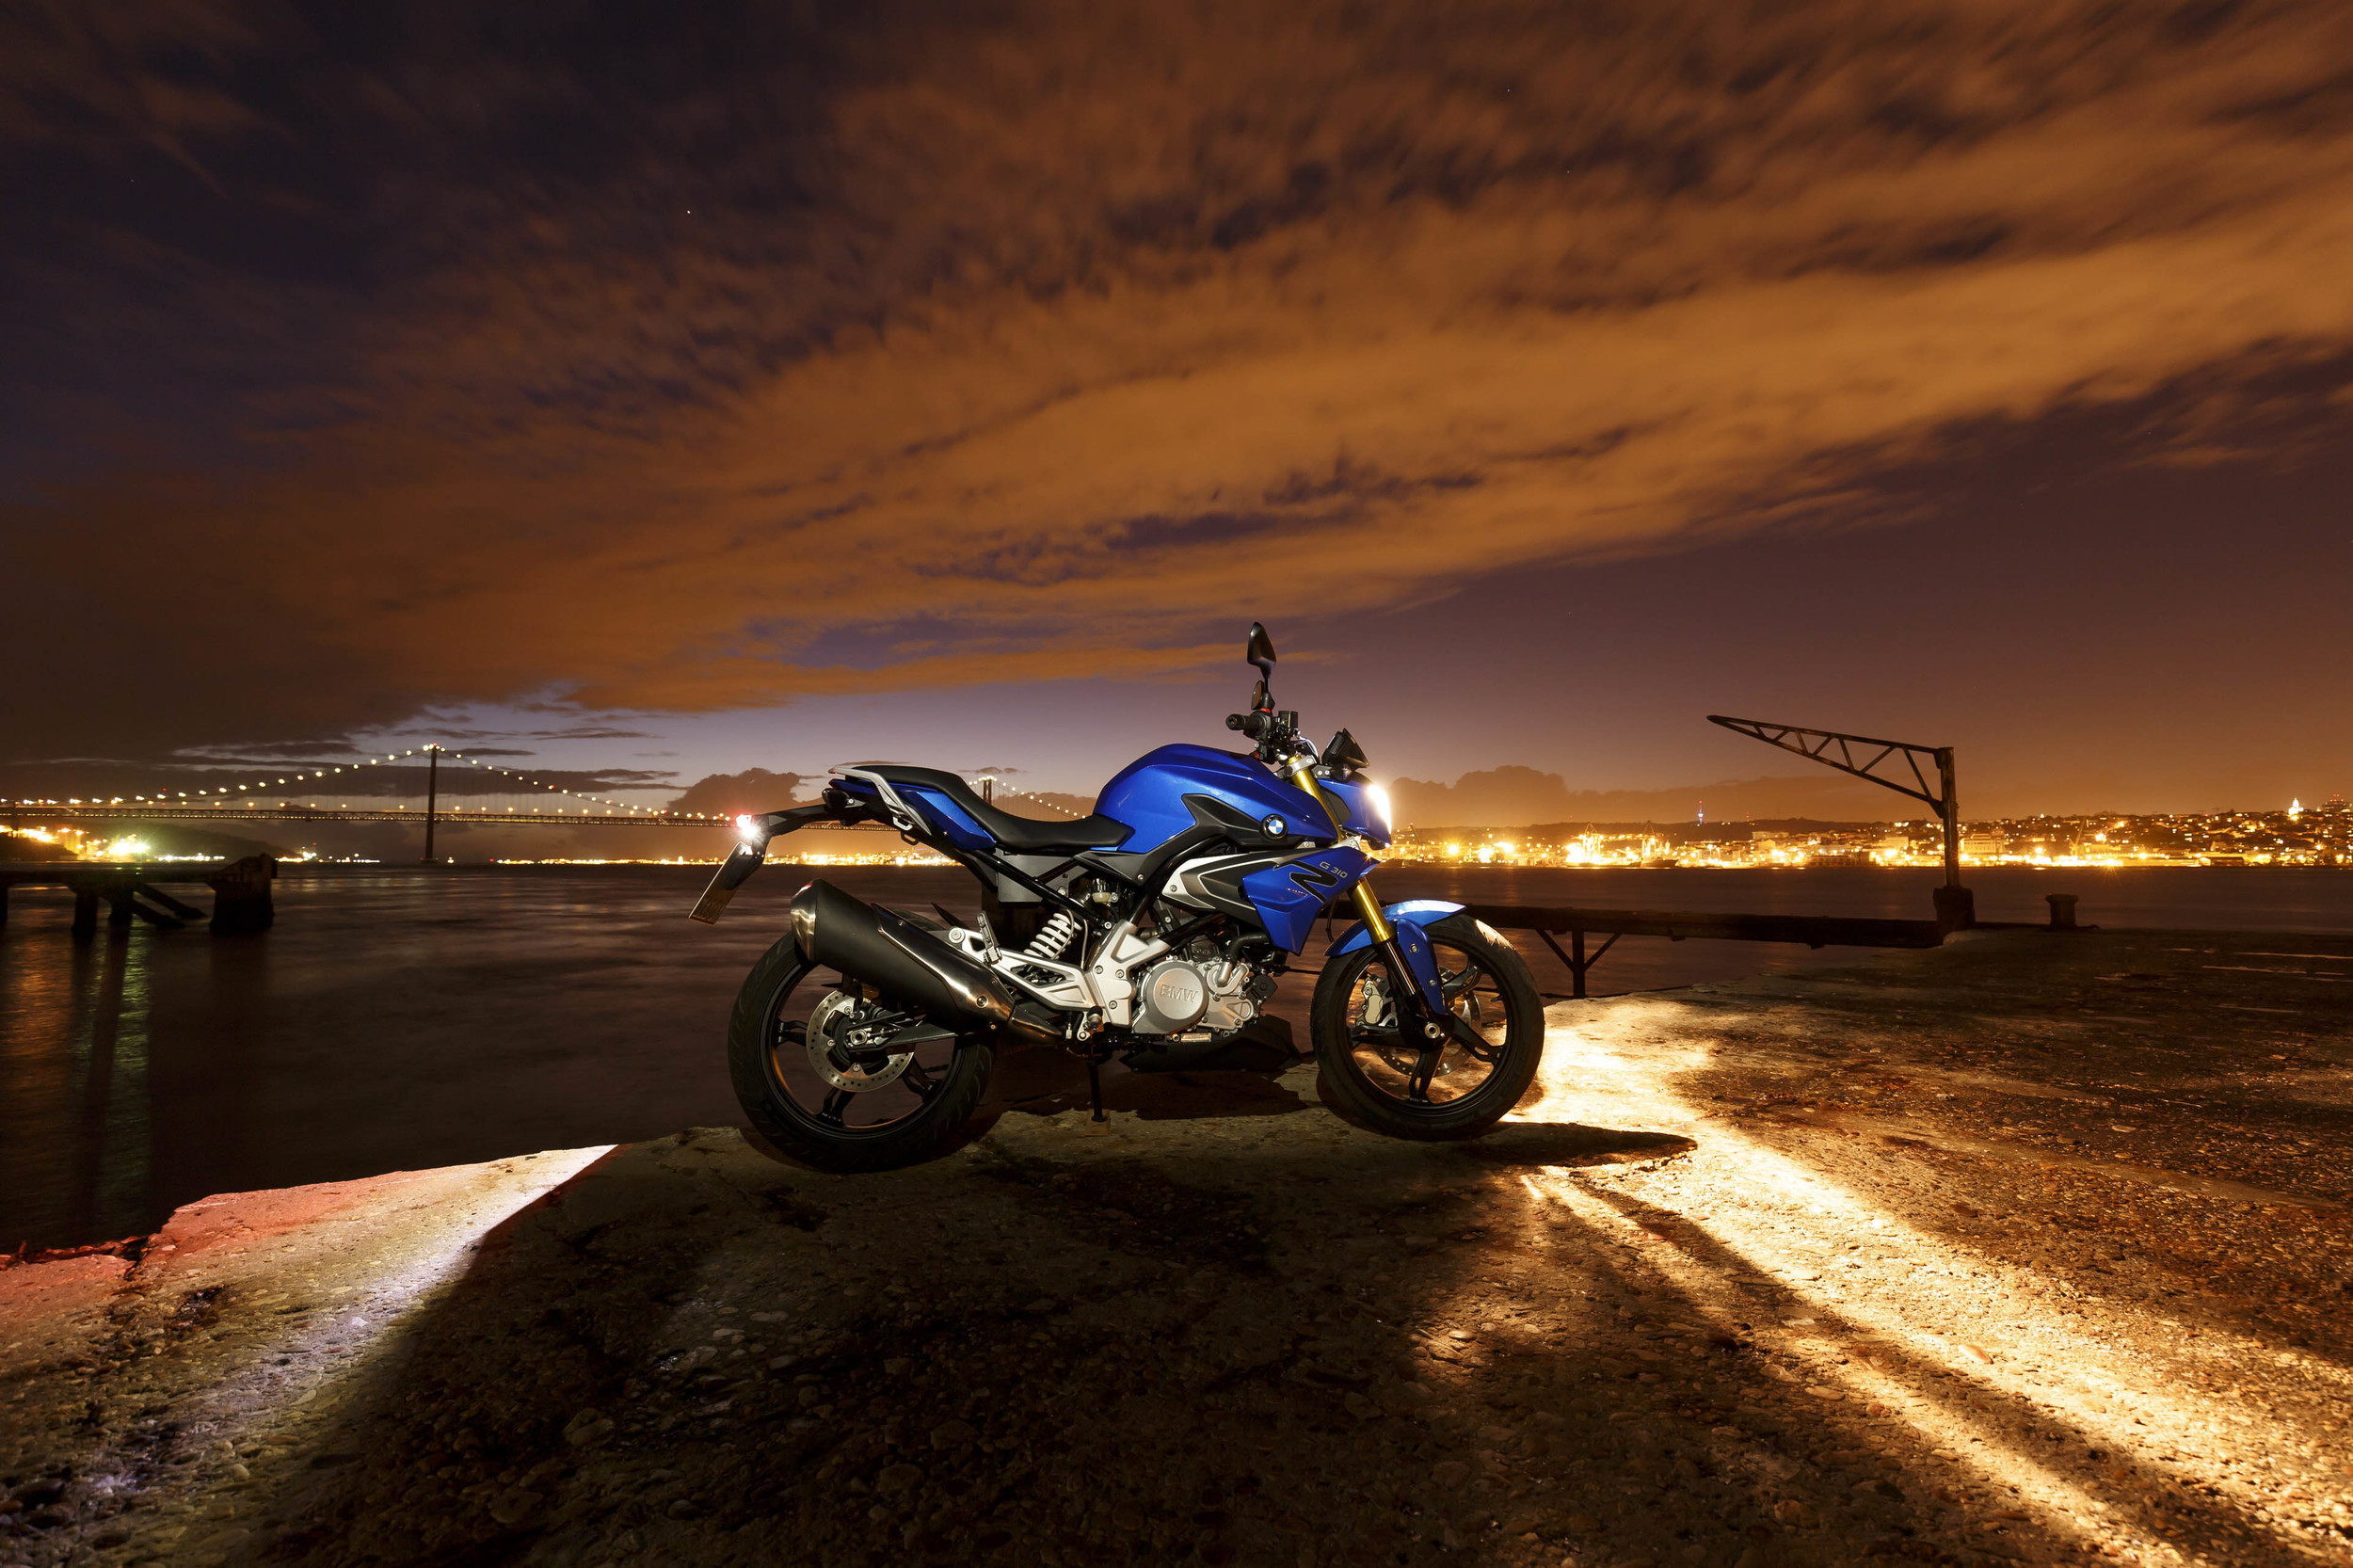 Мотоцикл БМВ g310r #11